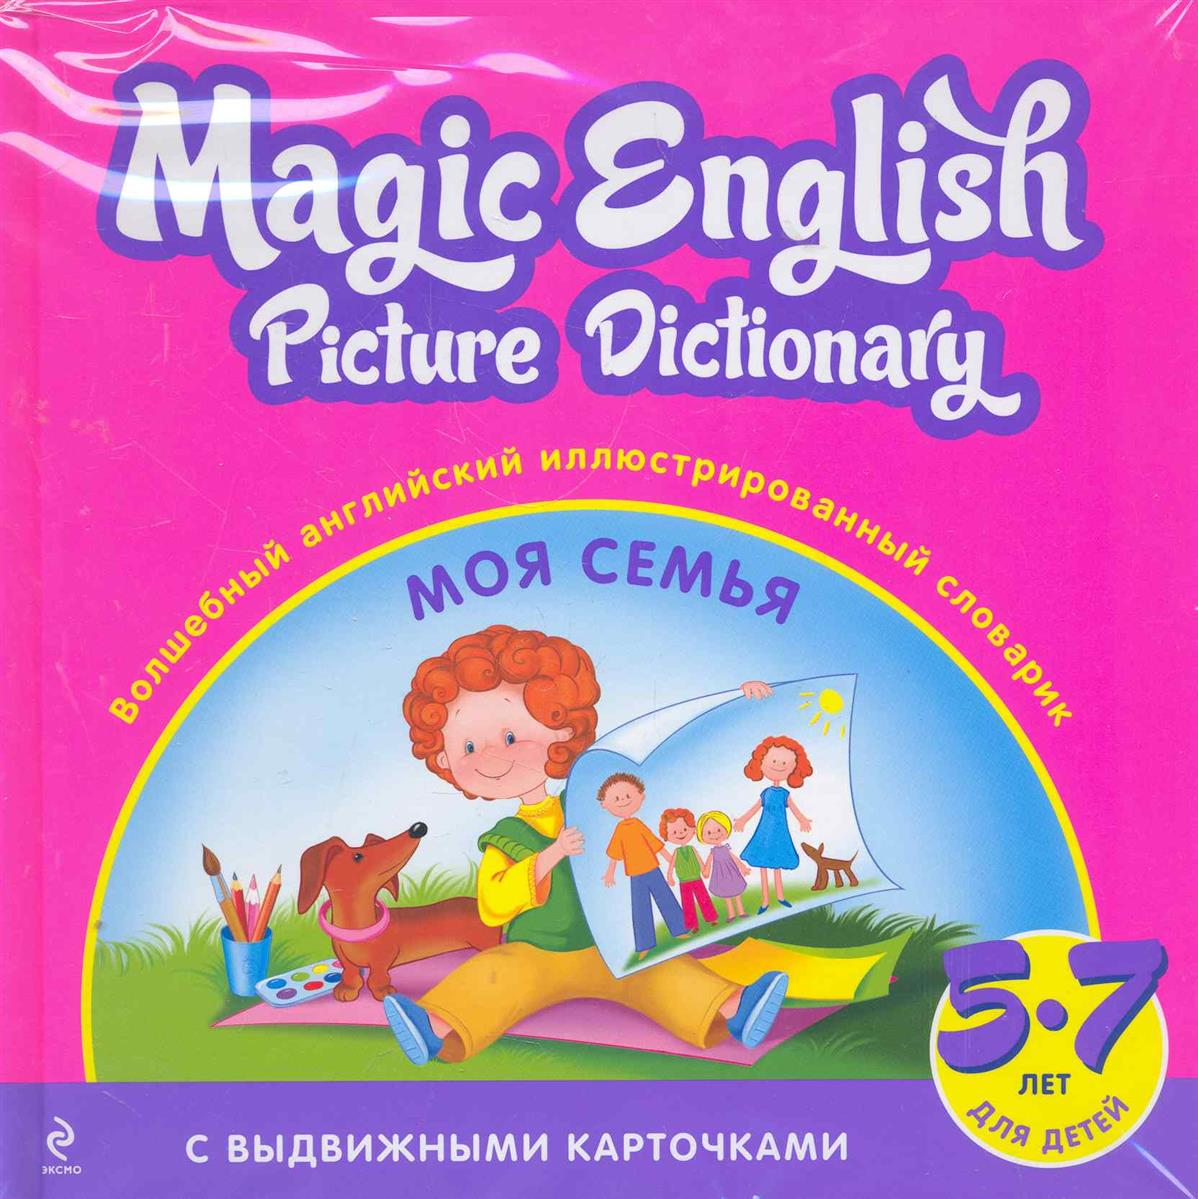 Magic English Picture Dictionary Волшебный англ. илл. словарик Моя семья cobuild intermediate learner's dictionary